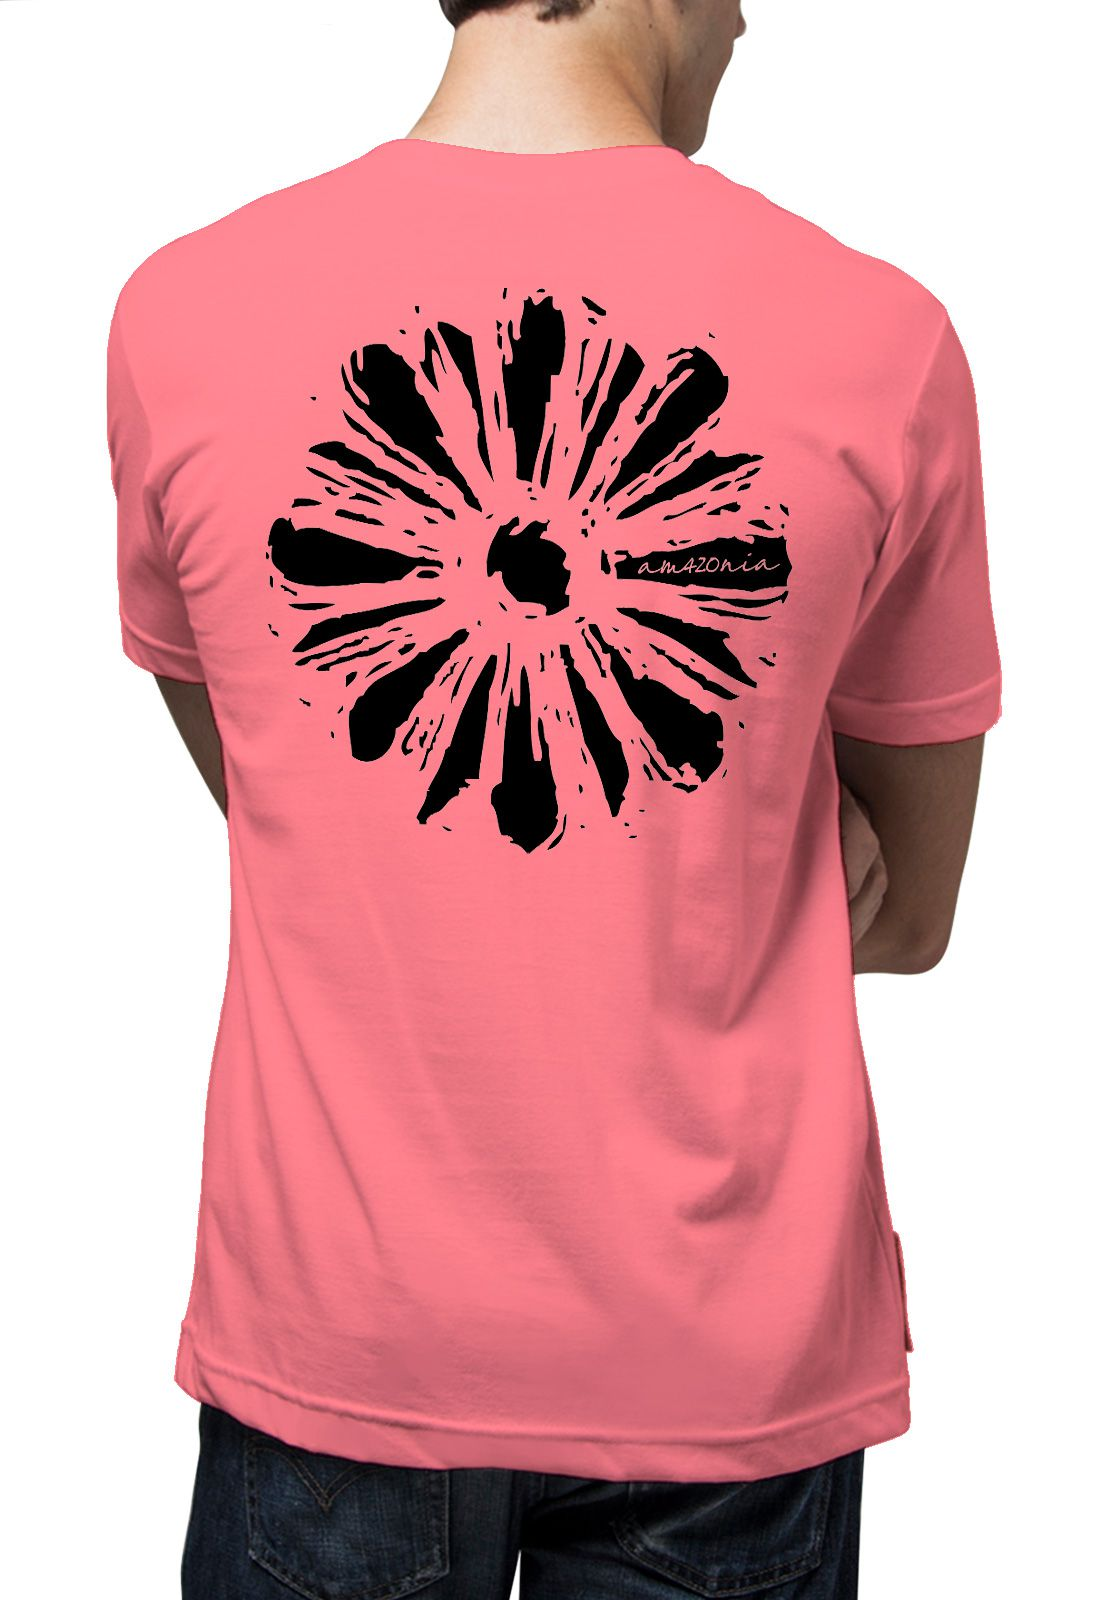 Camiseta Amazônia Flor Simples Roots - Rosa